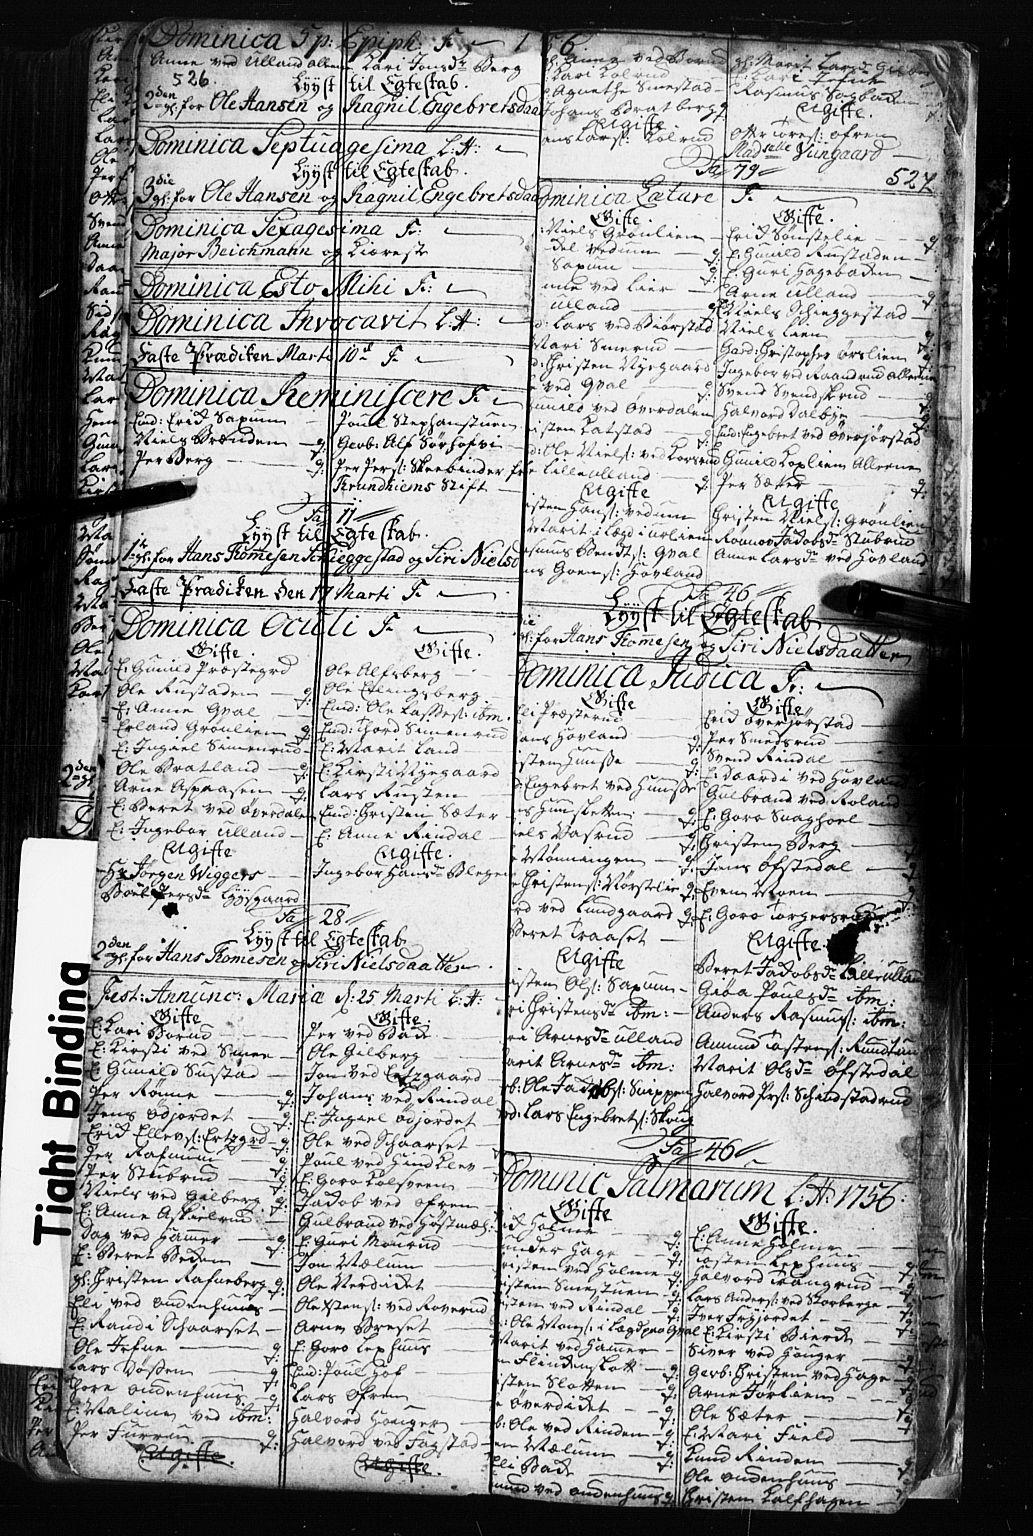 SAH, Fåberg prestekontor, Klokkerbok nr. 2, 1741-1756, s. 526-527